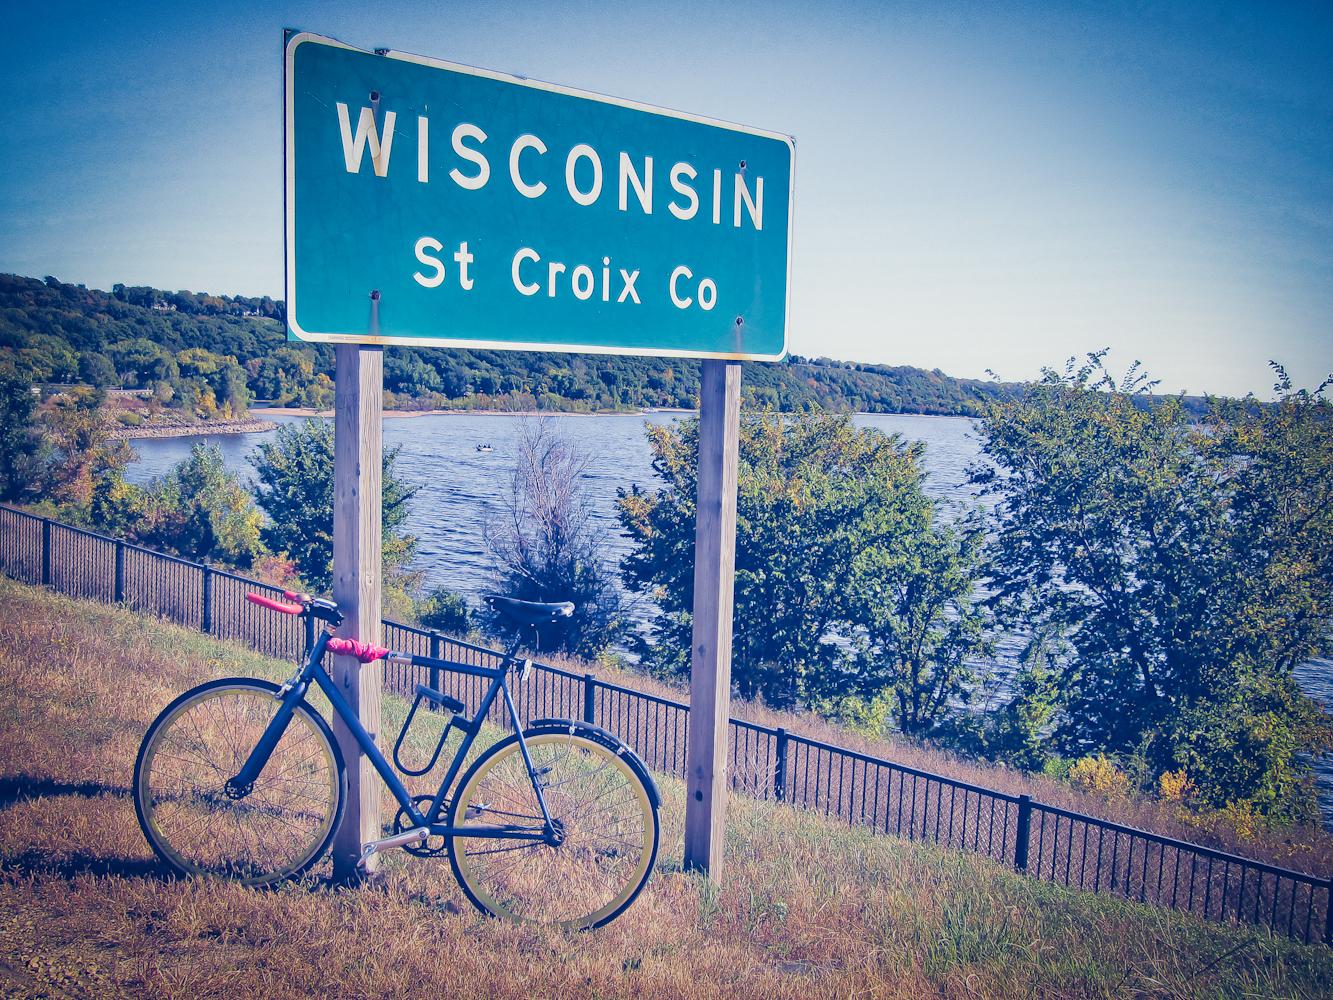 Now Entering Wisconsin